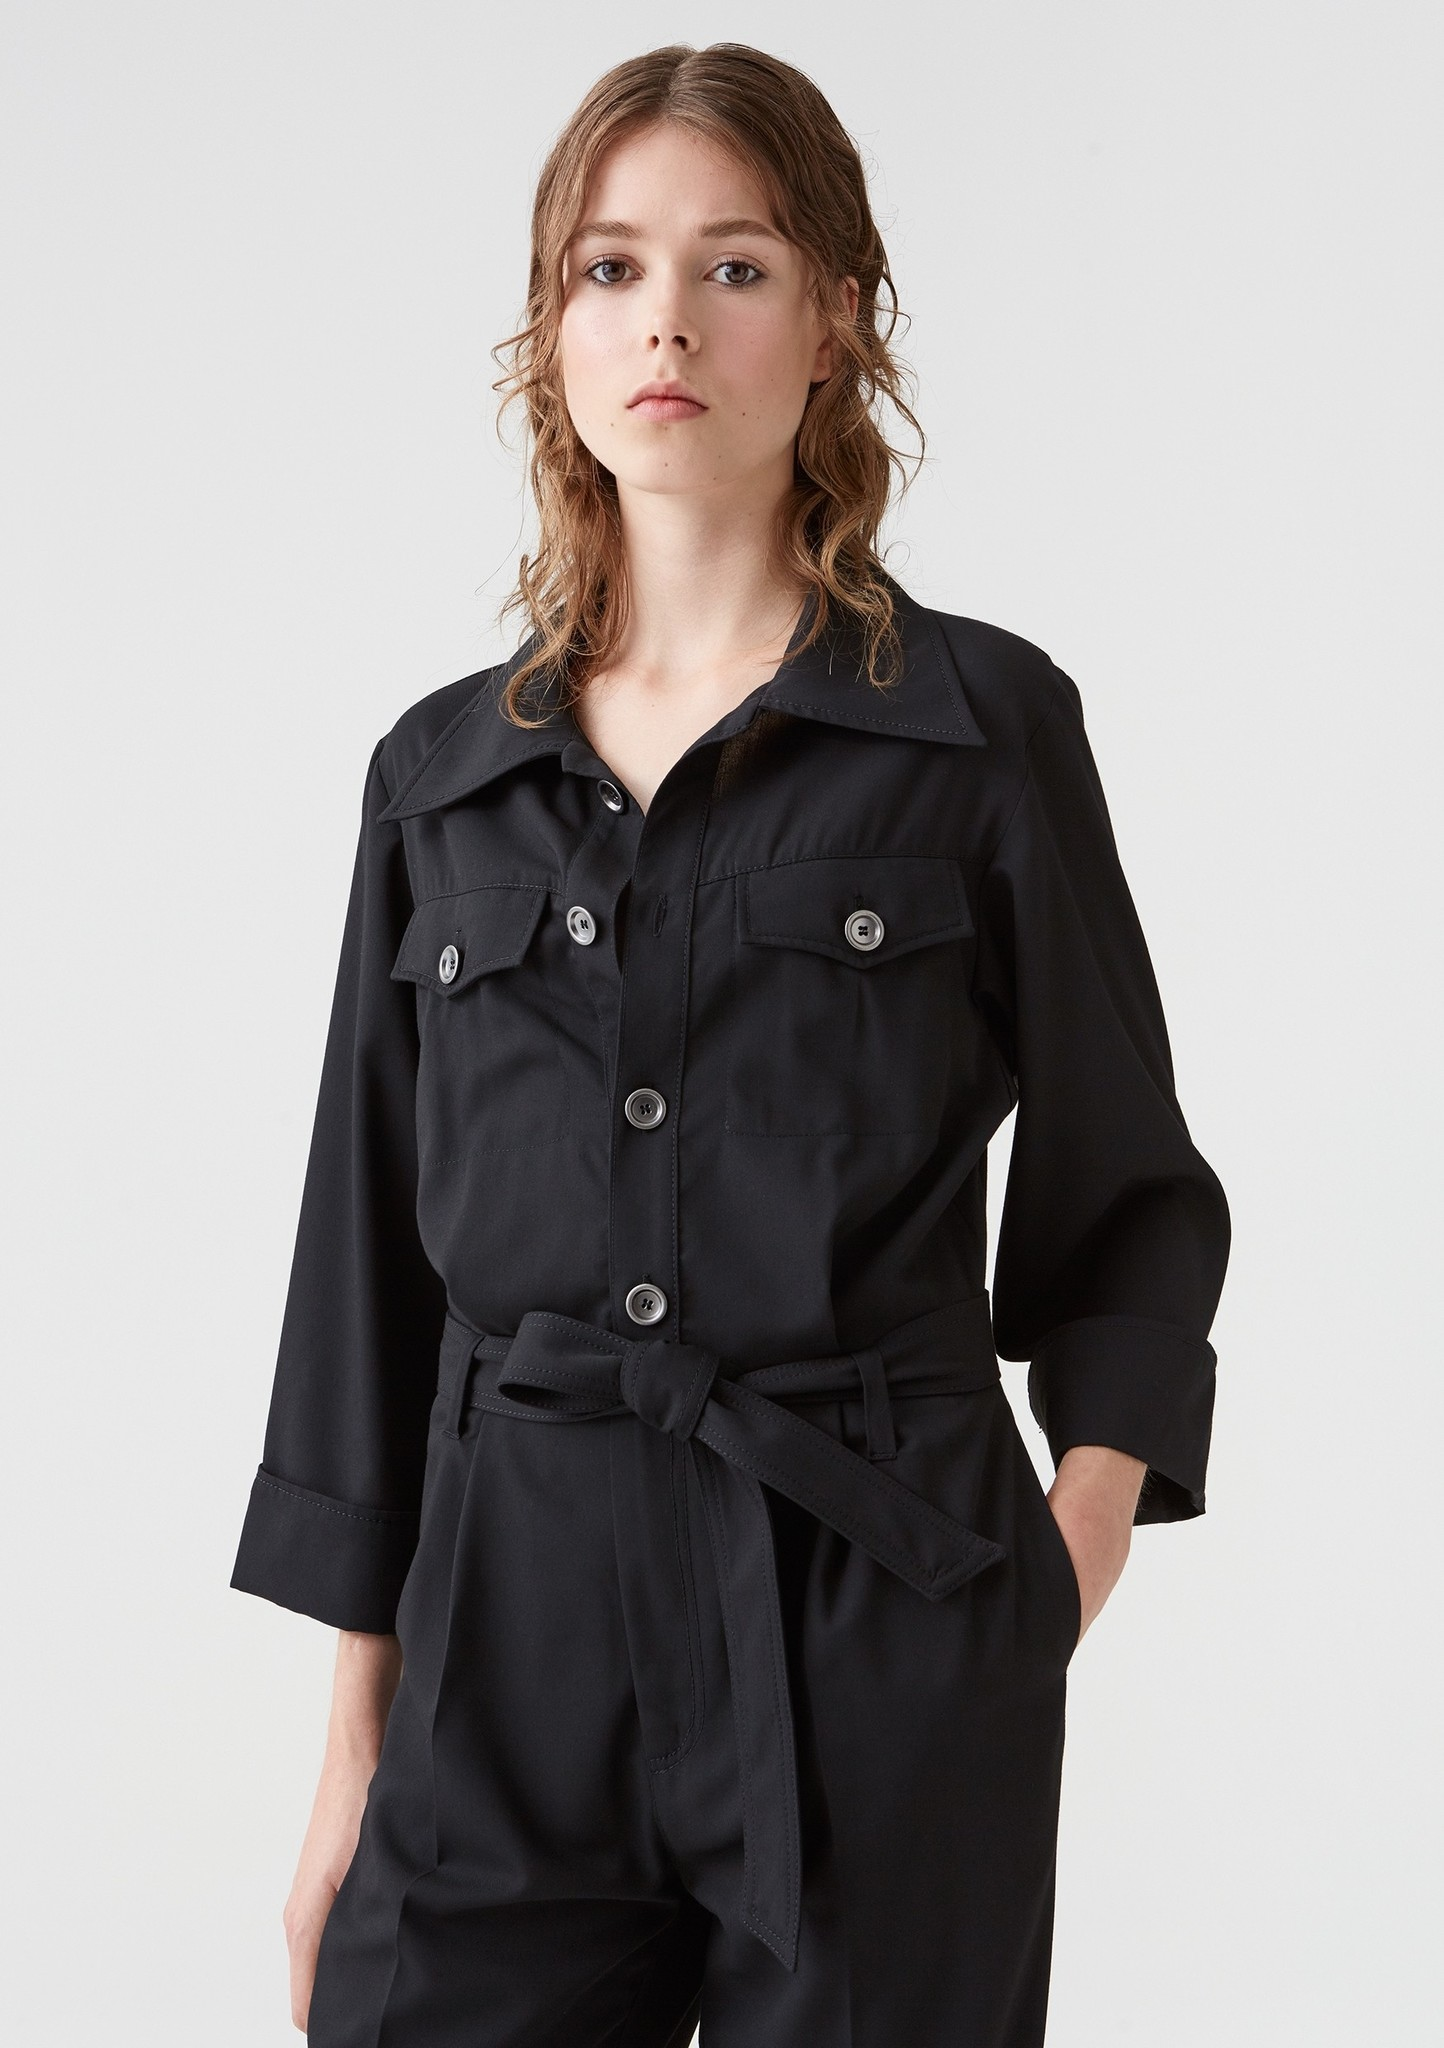 Sync jumpsuit Black